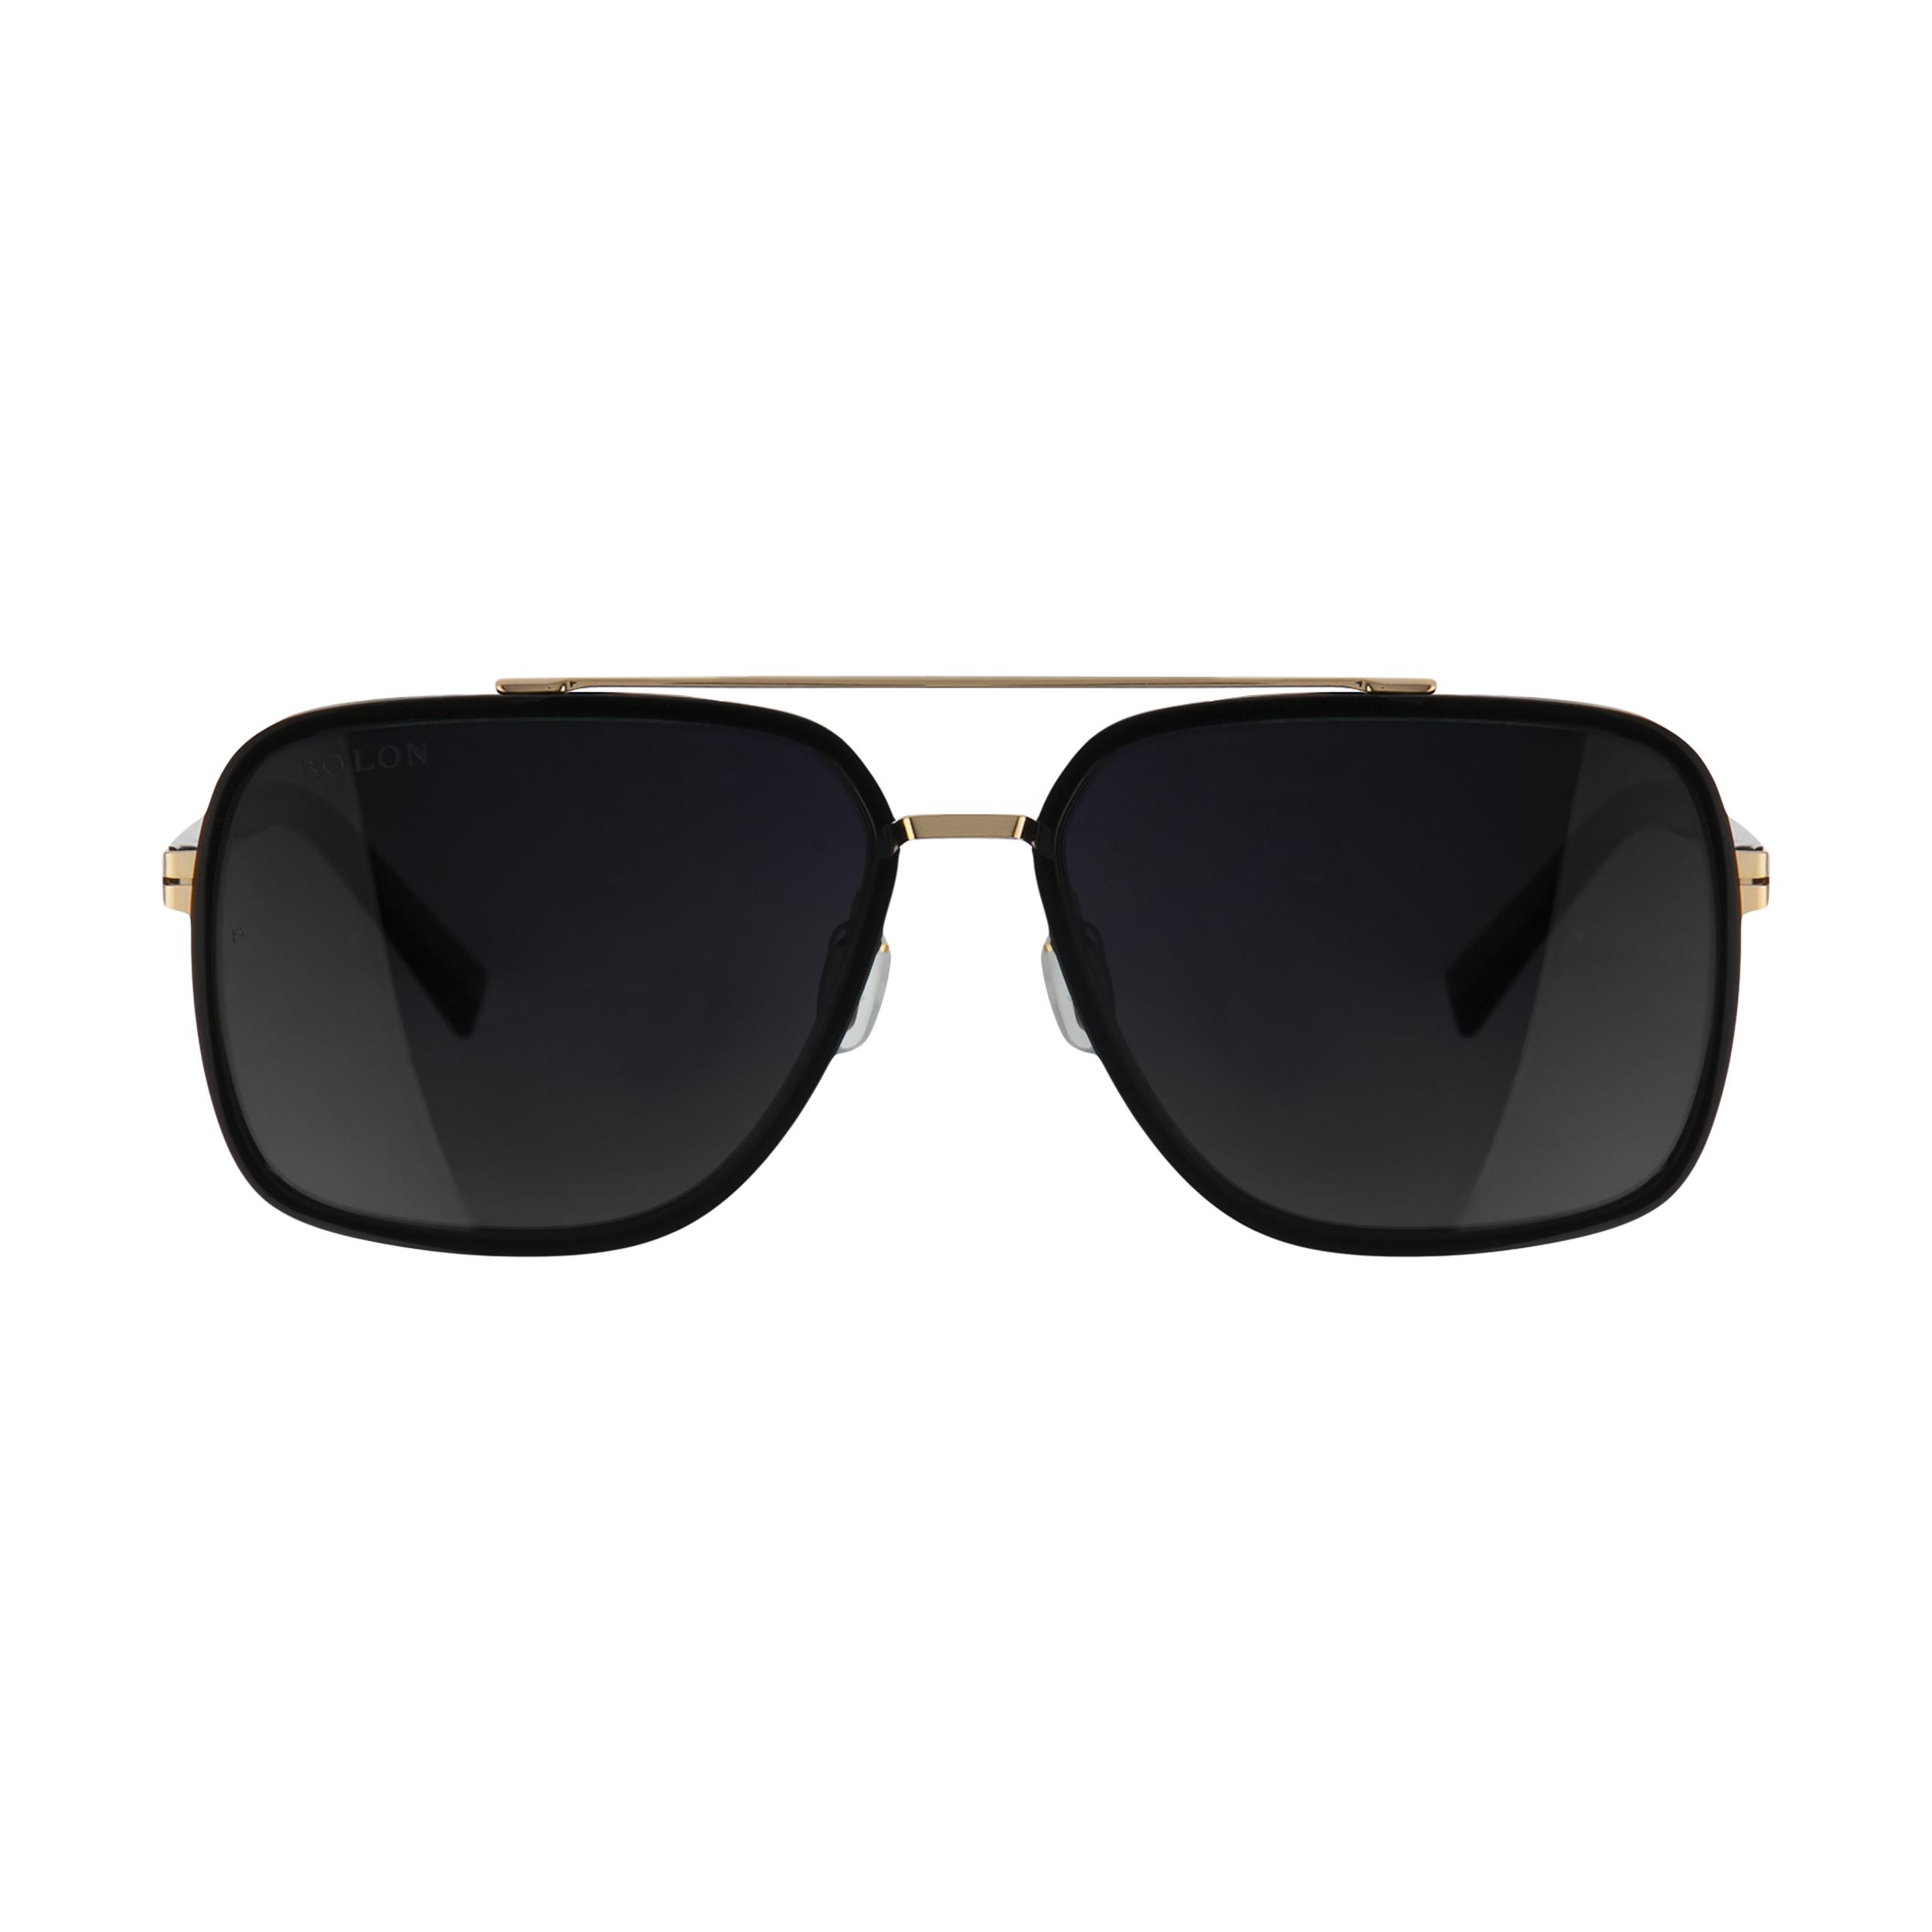 عینک آفتابی مردانه بولون مدل BL6032C10